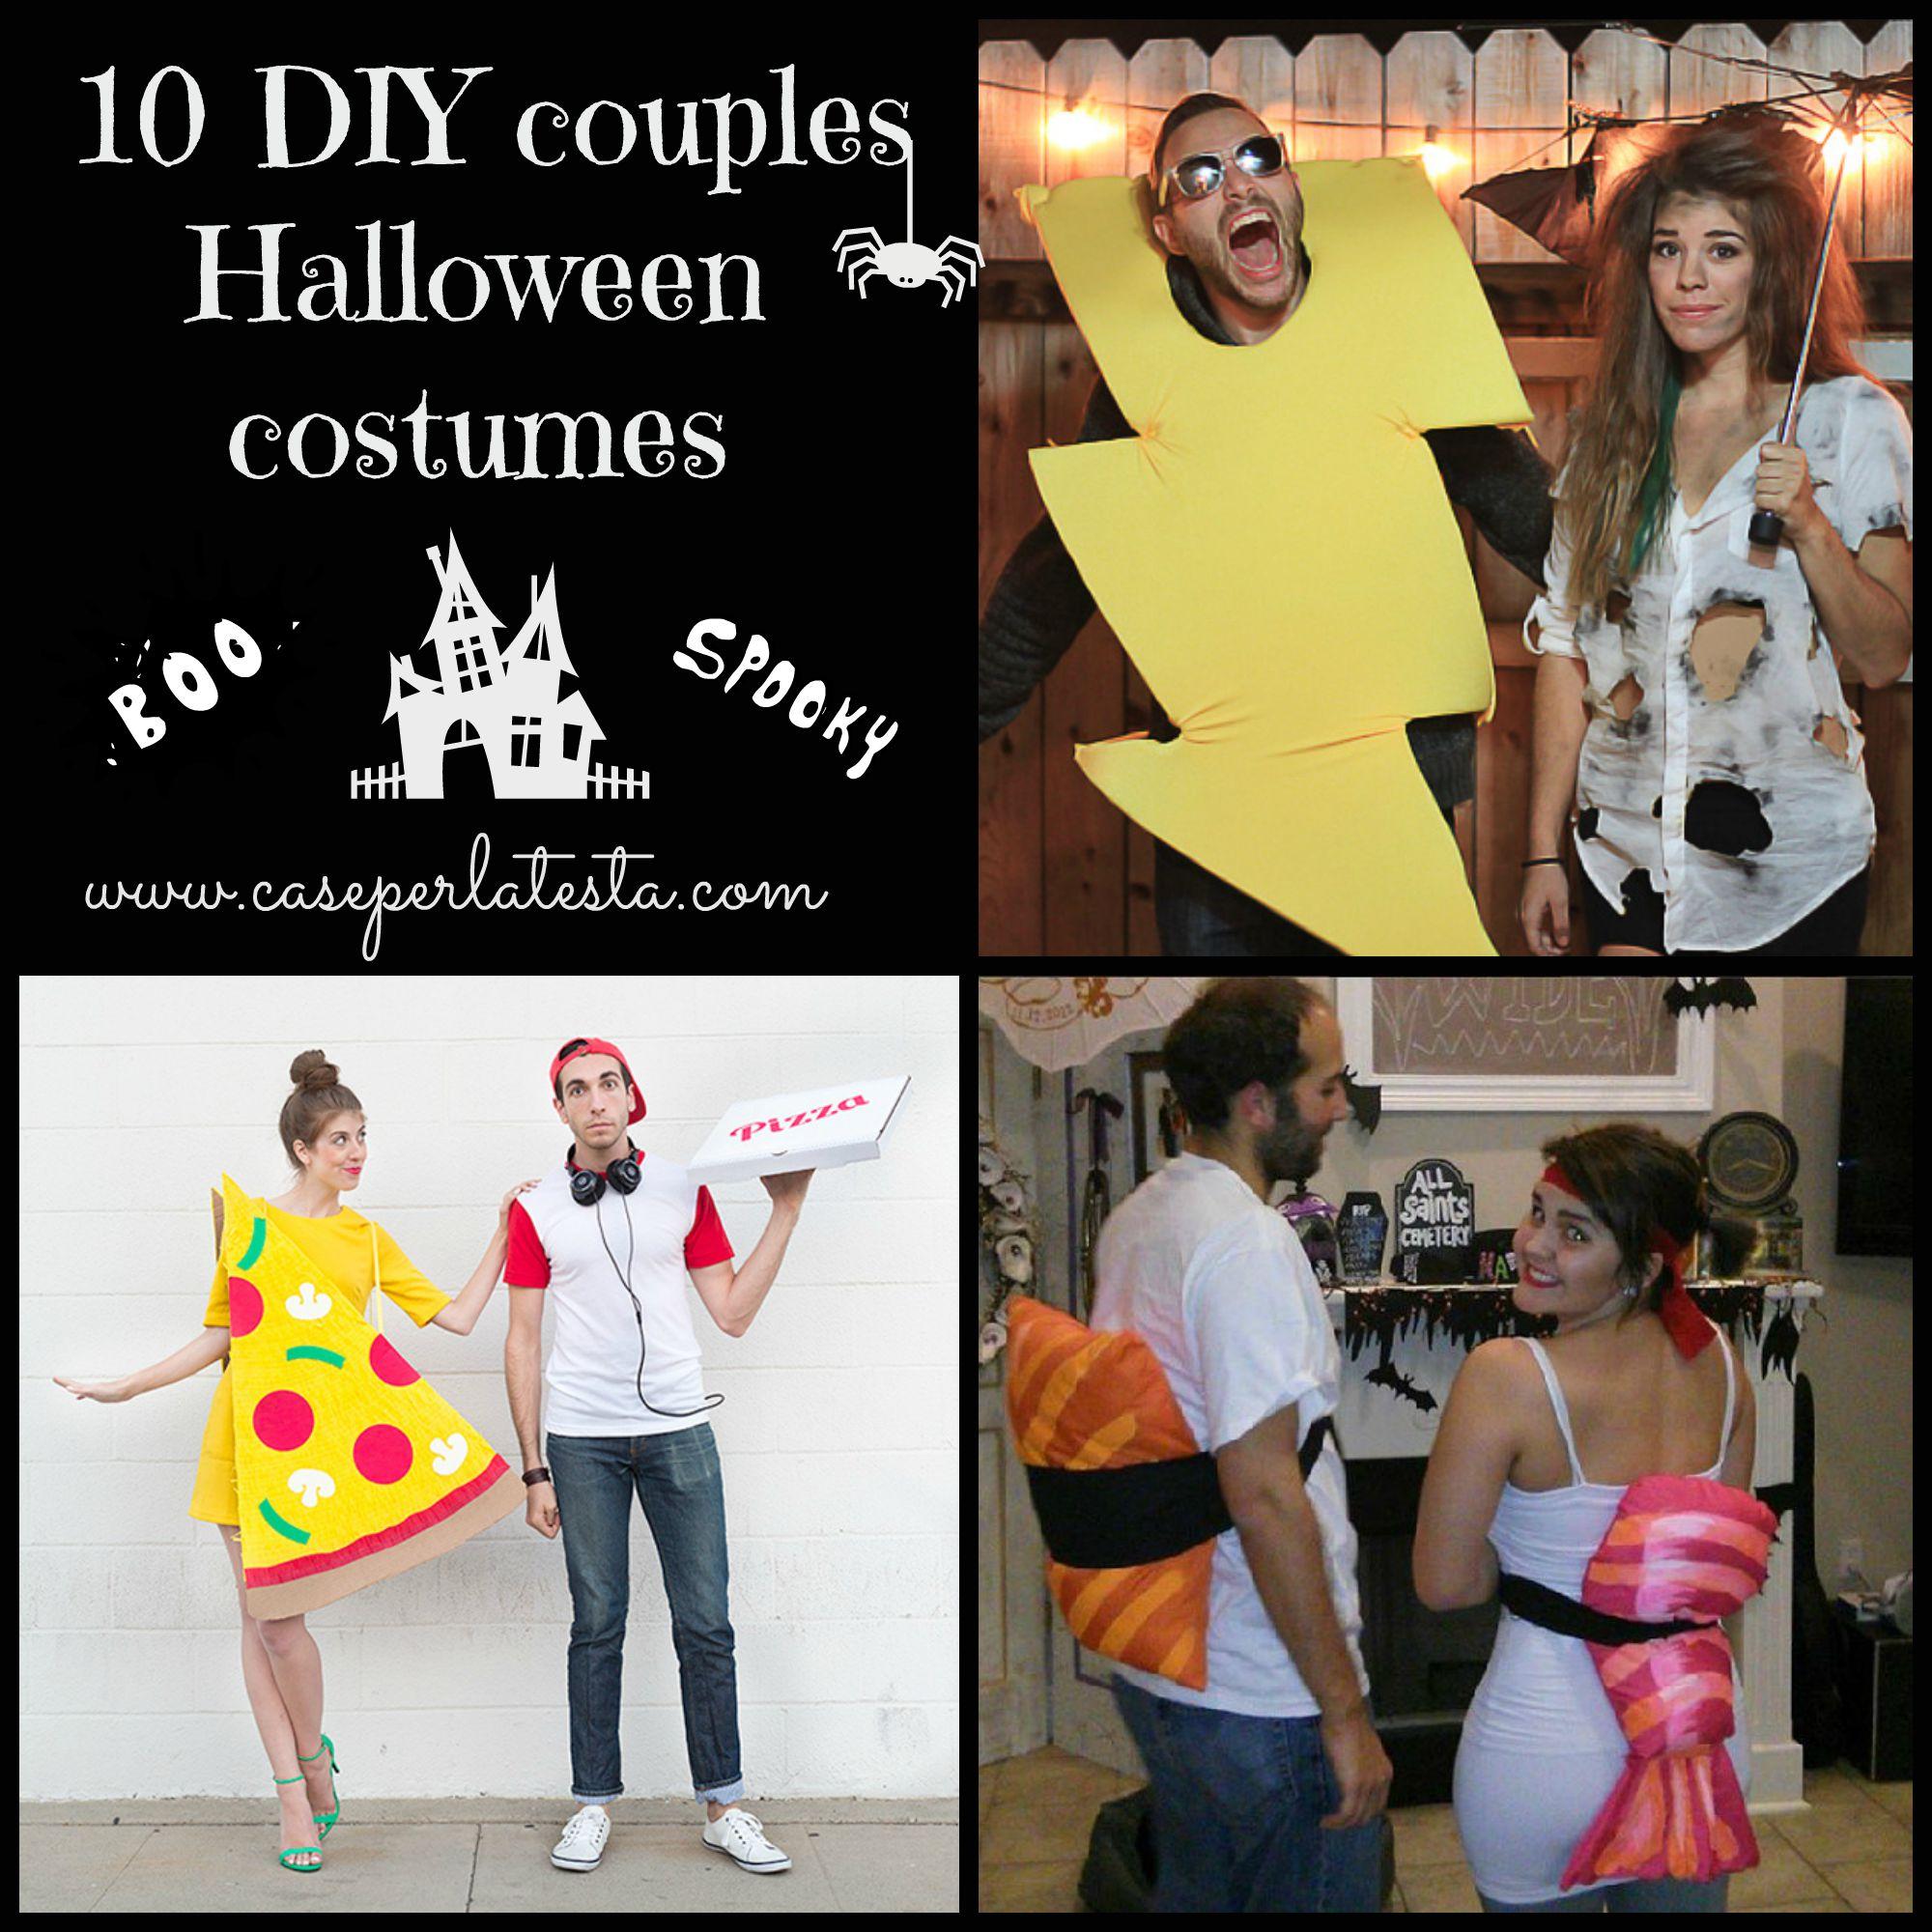 15 costumi di halloween fai da te per coppie 15 diy for Spranga per porta fai da te